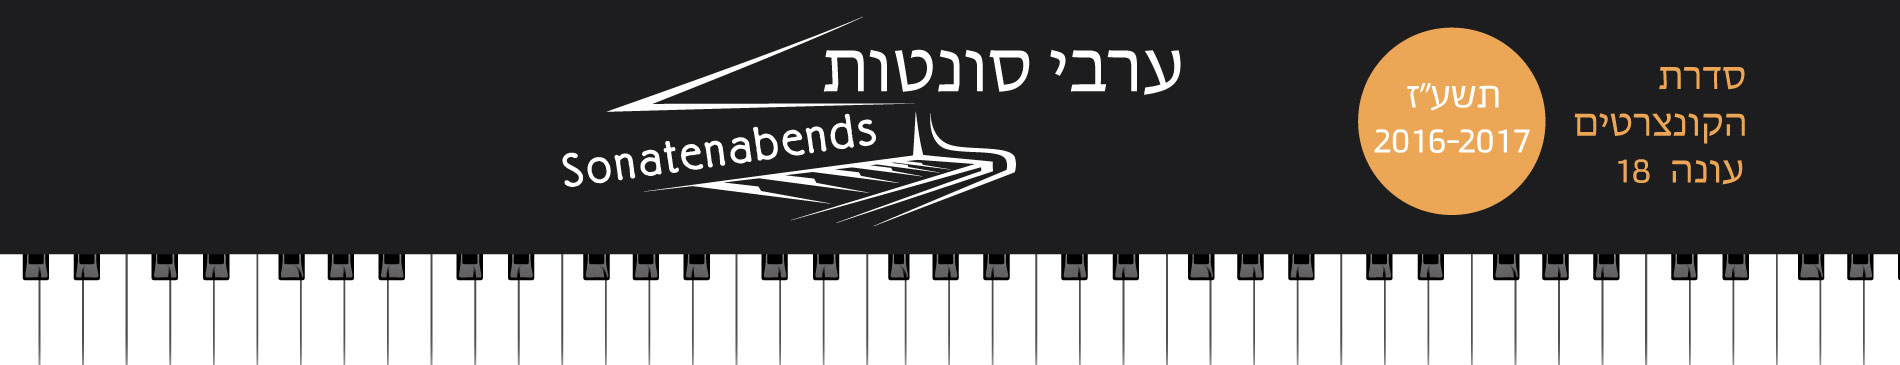 ערבי סונטות #6 - הסונטות של היידן ובטהובן